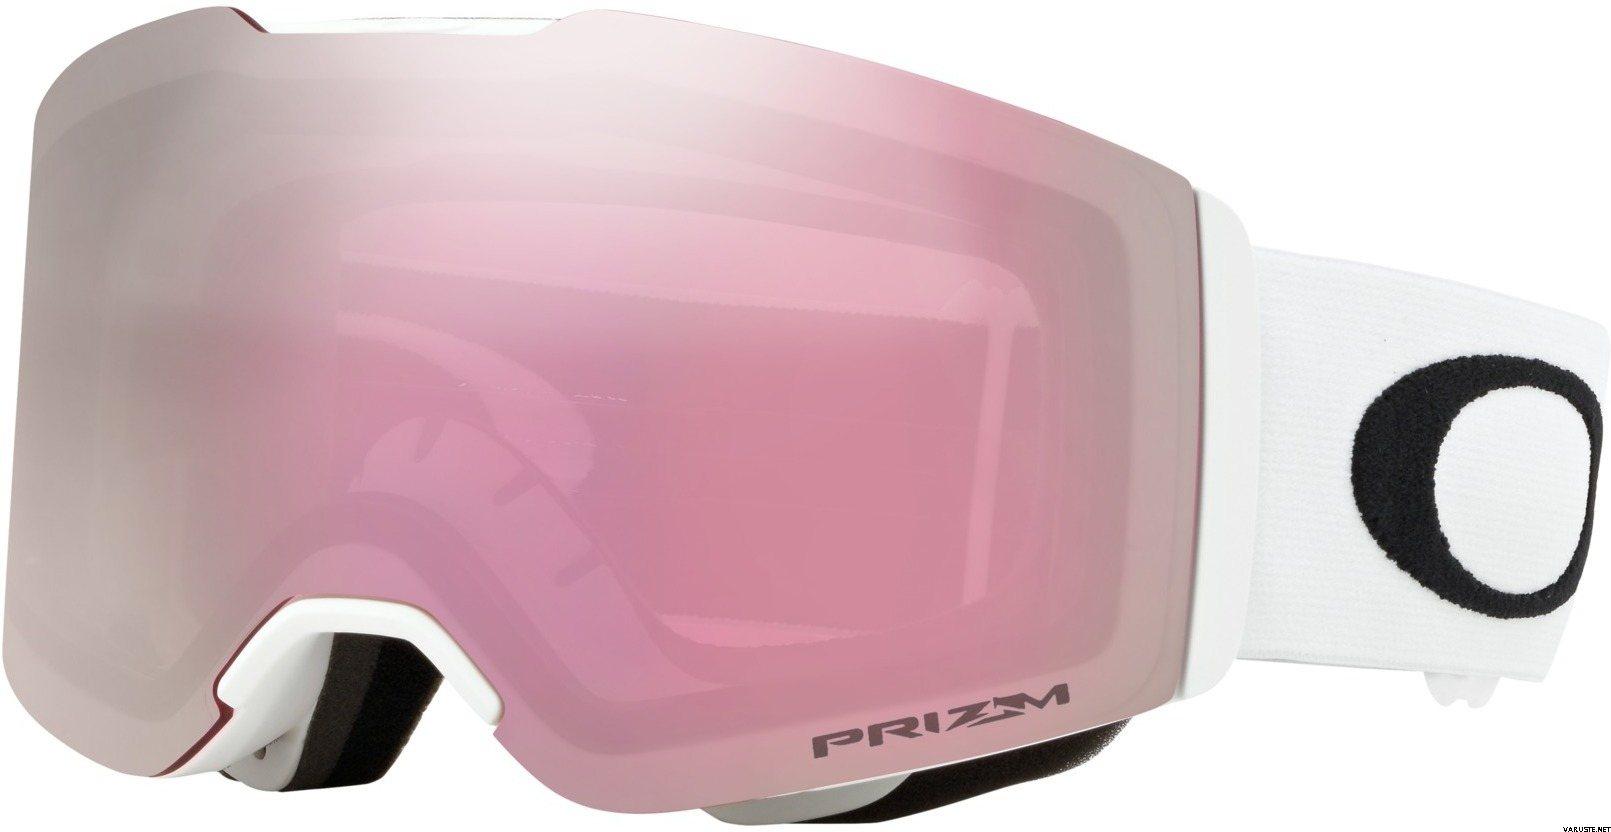 c904c9ff9f25 Oakley fall line matte white prizm hi pink oakley fall line jpg 1611x832  Pink oakley